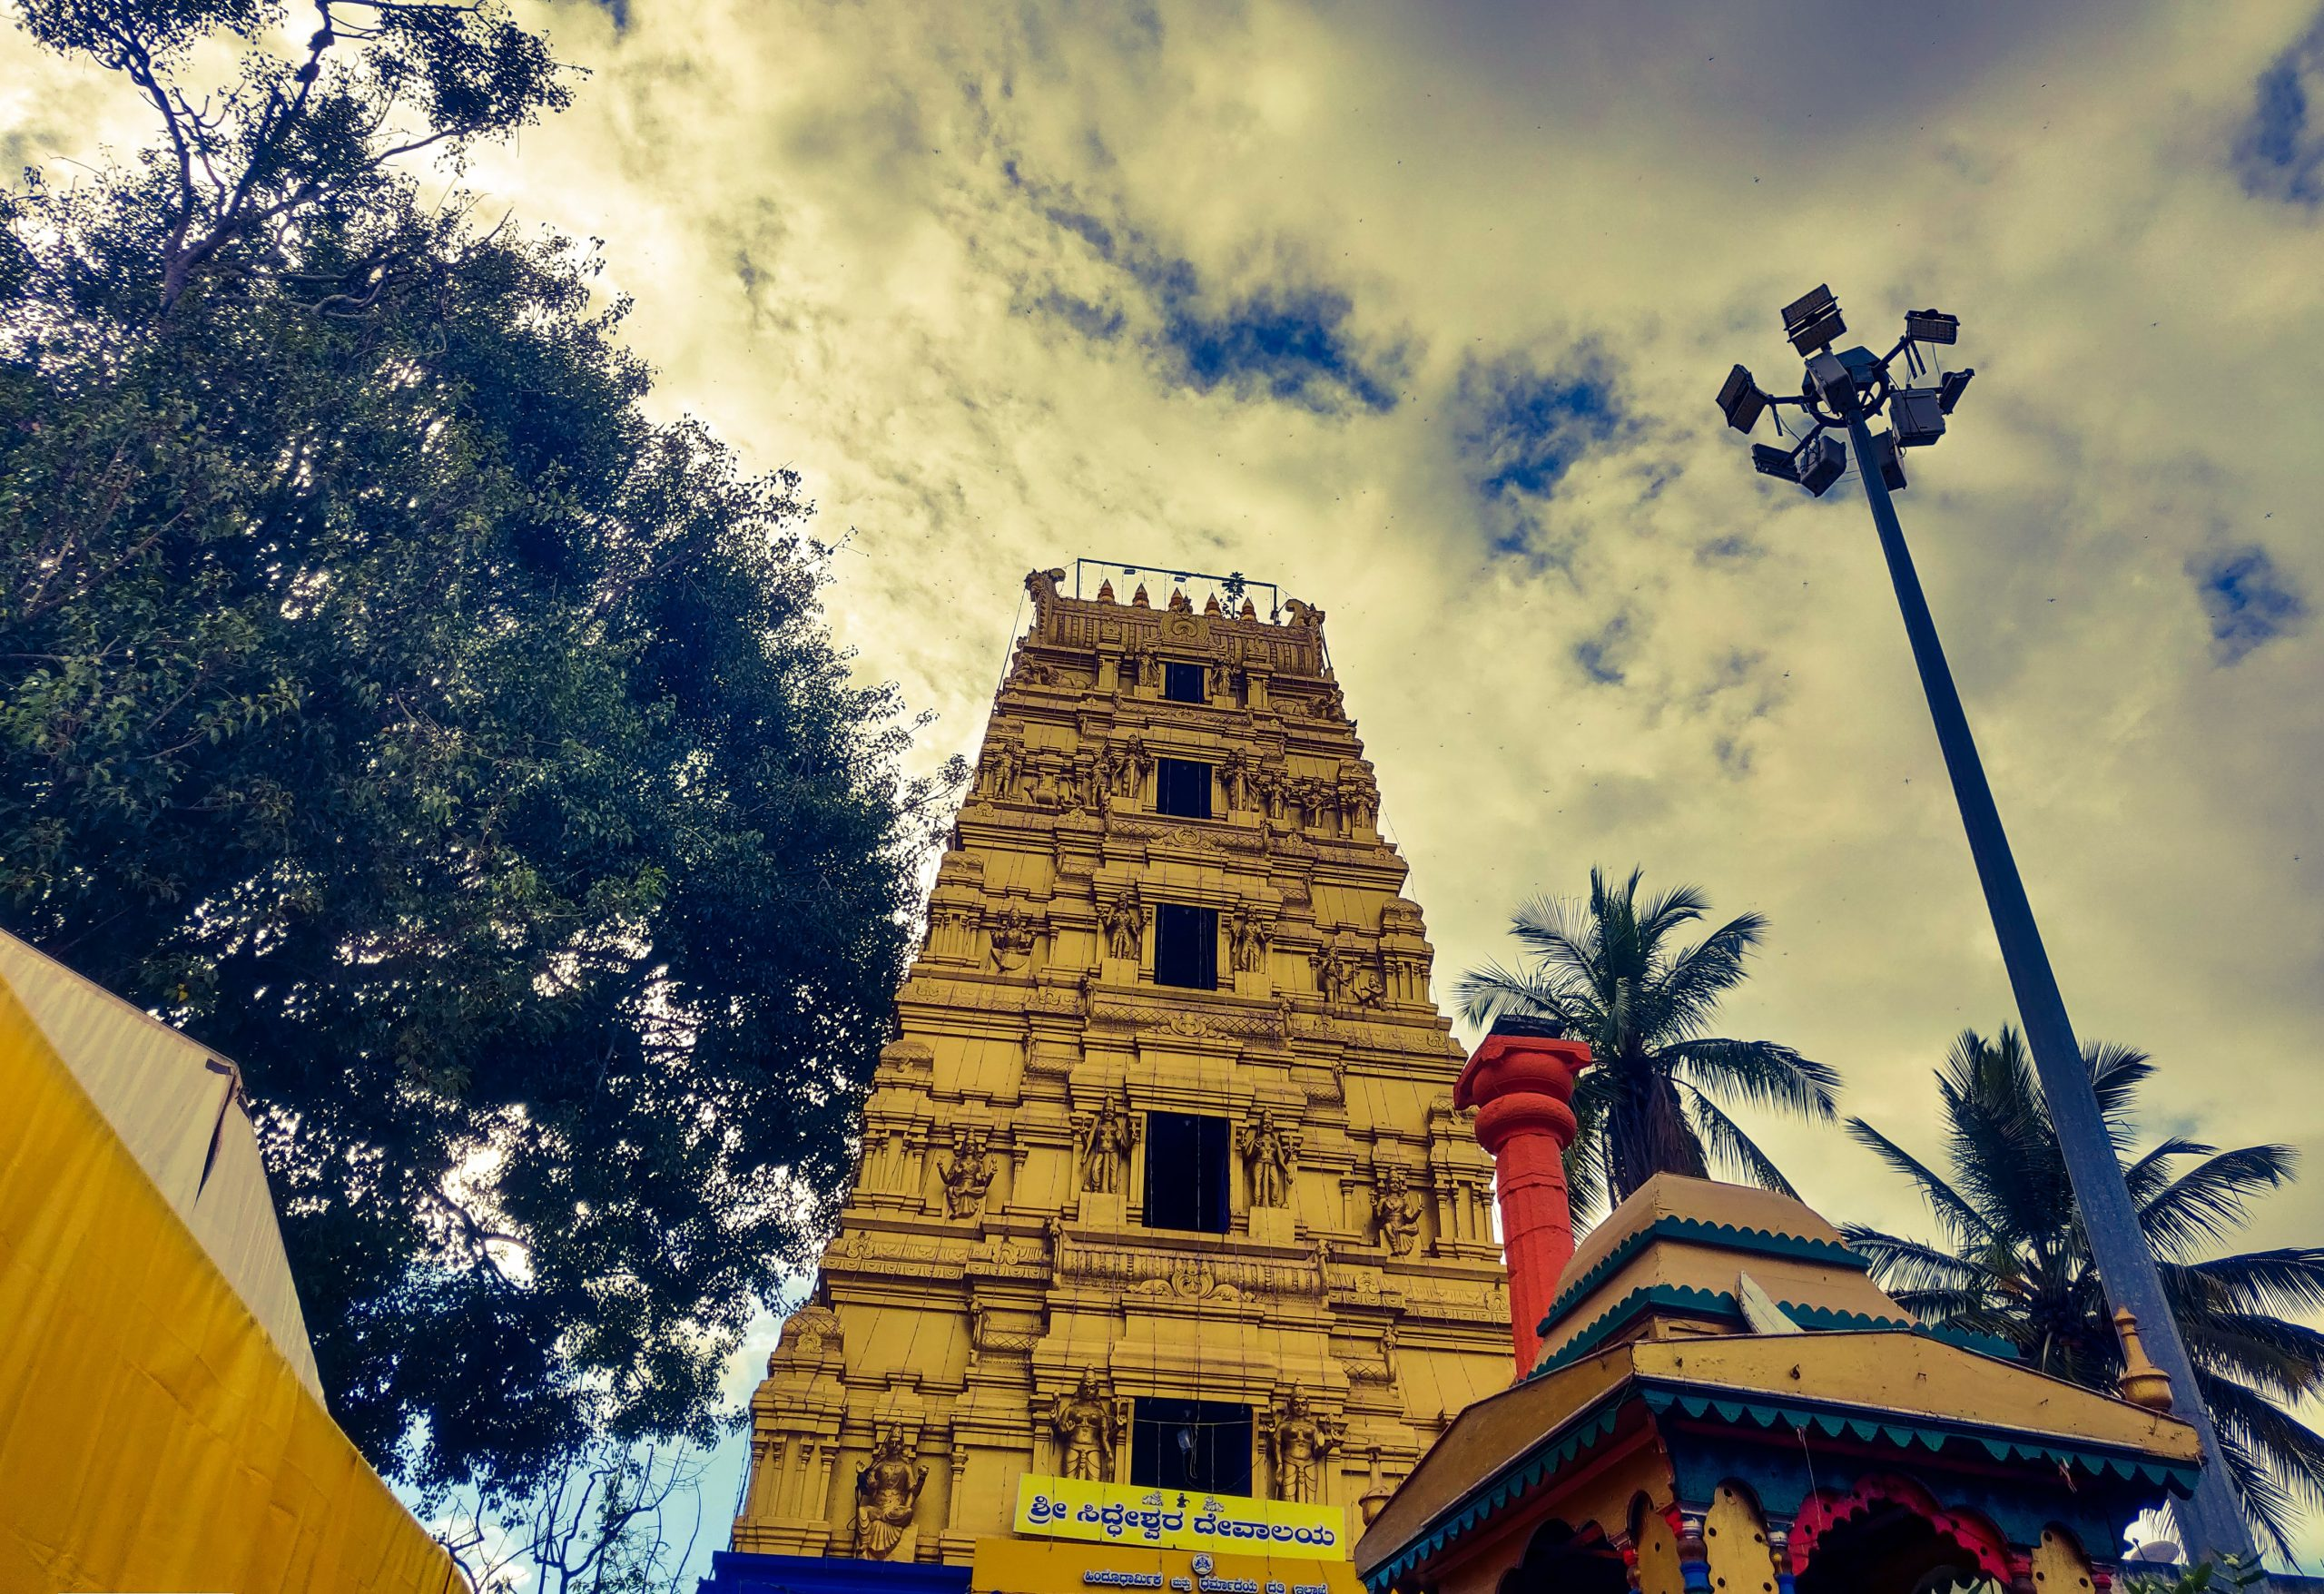 Hasanamba Temple in Hassan, Karnataka